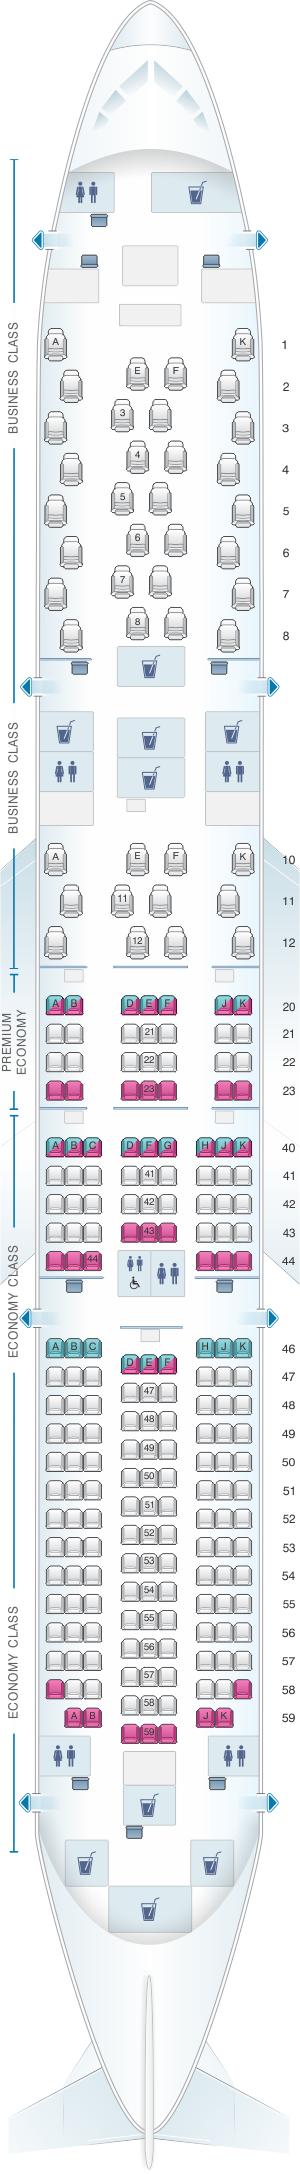 Seat map for Qantas Airways Boeing B787 9 Dreamliner